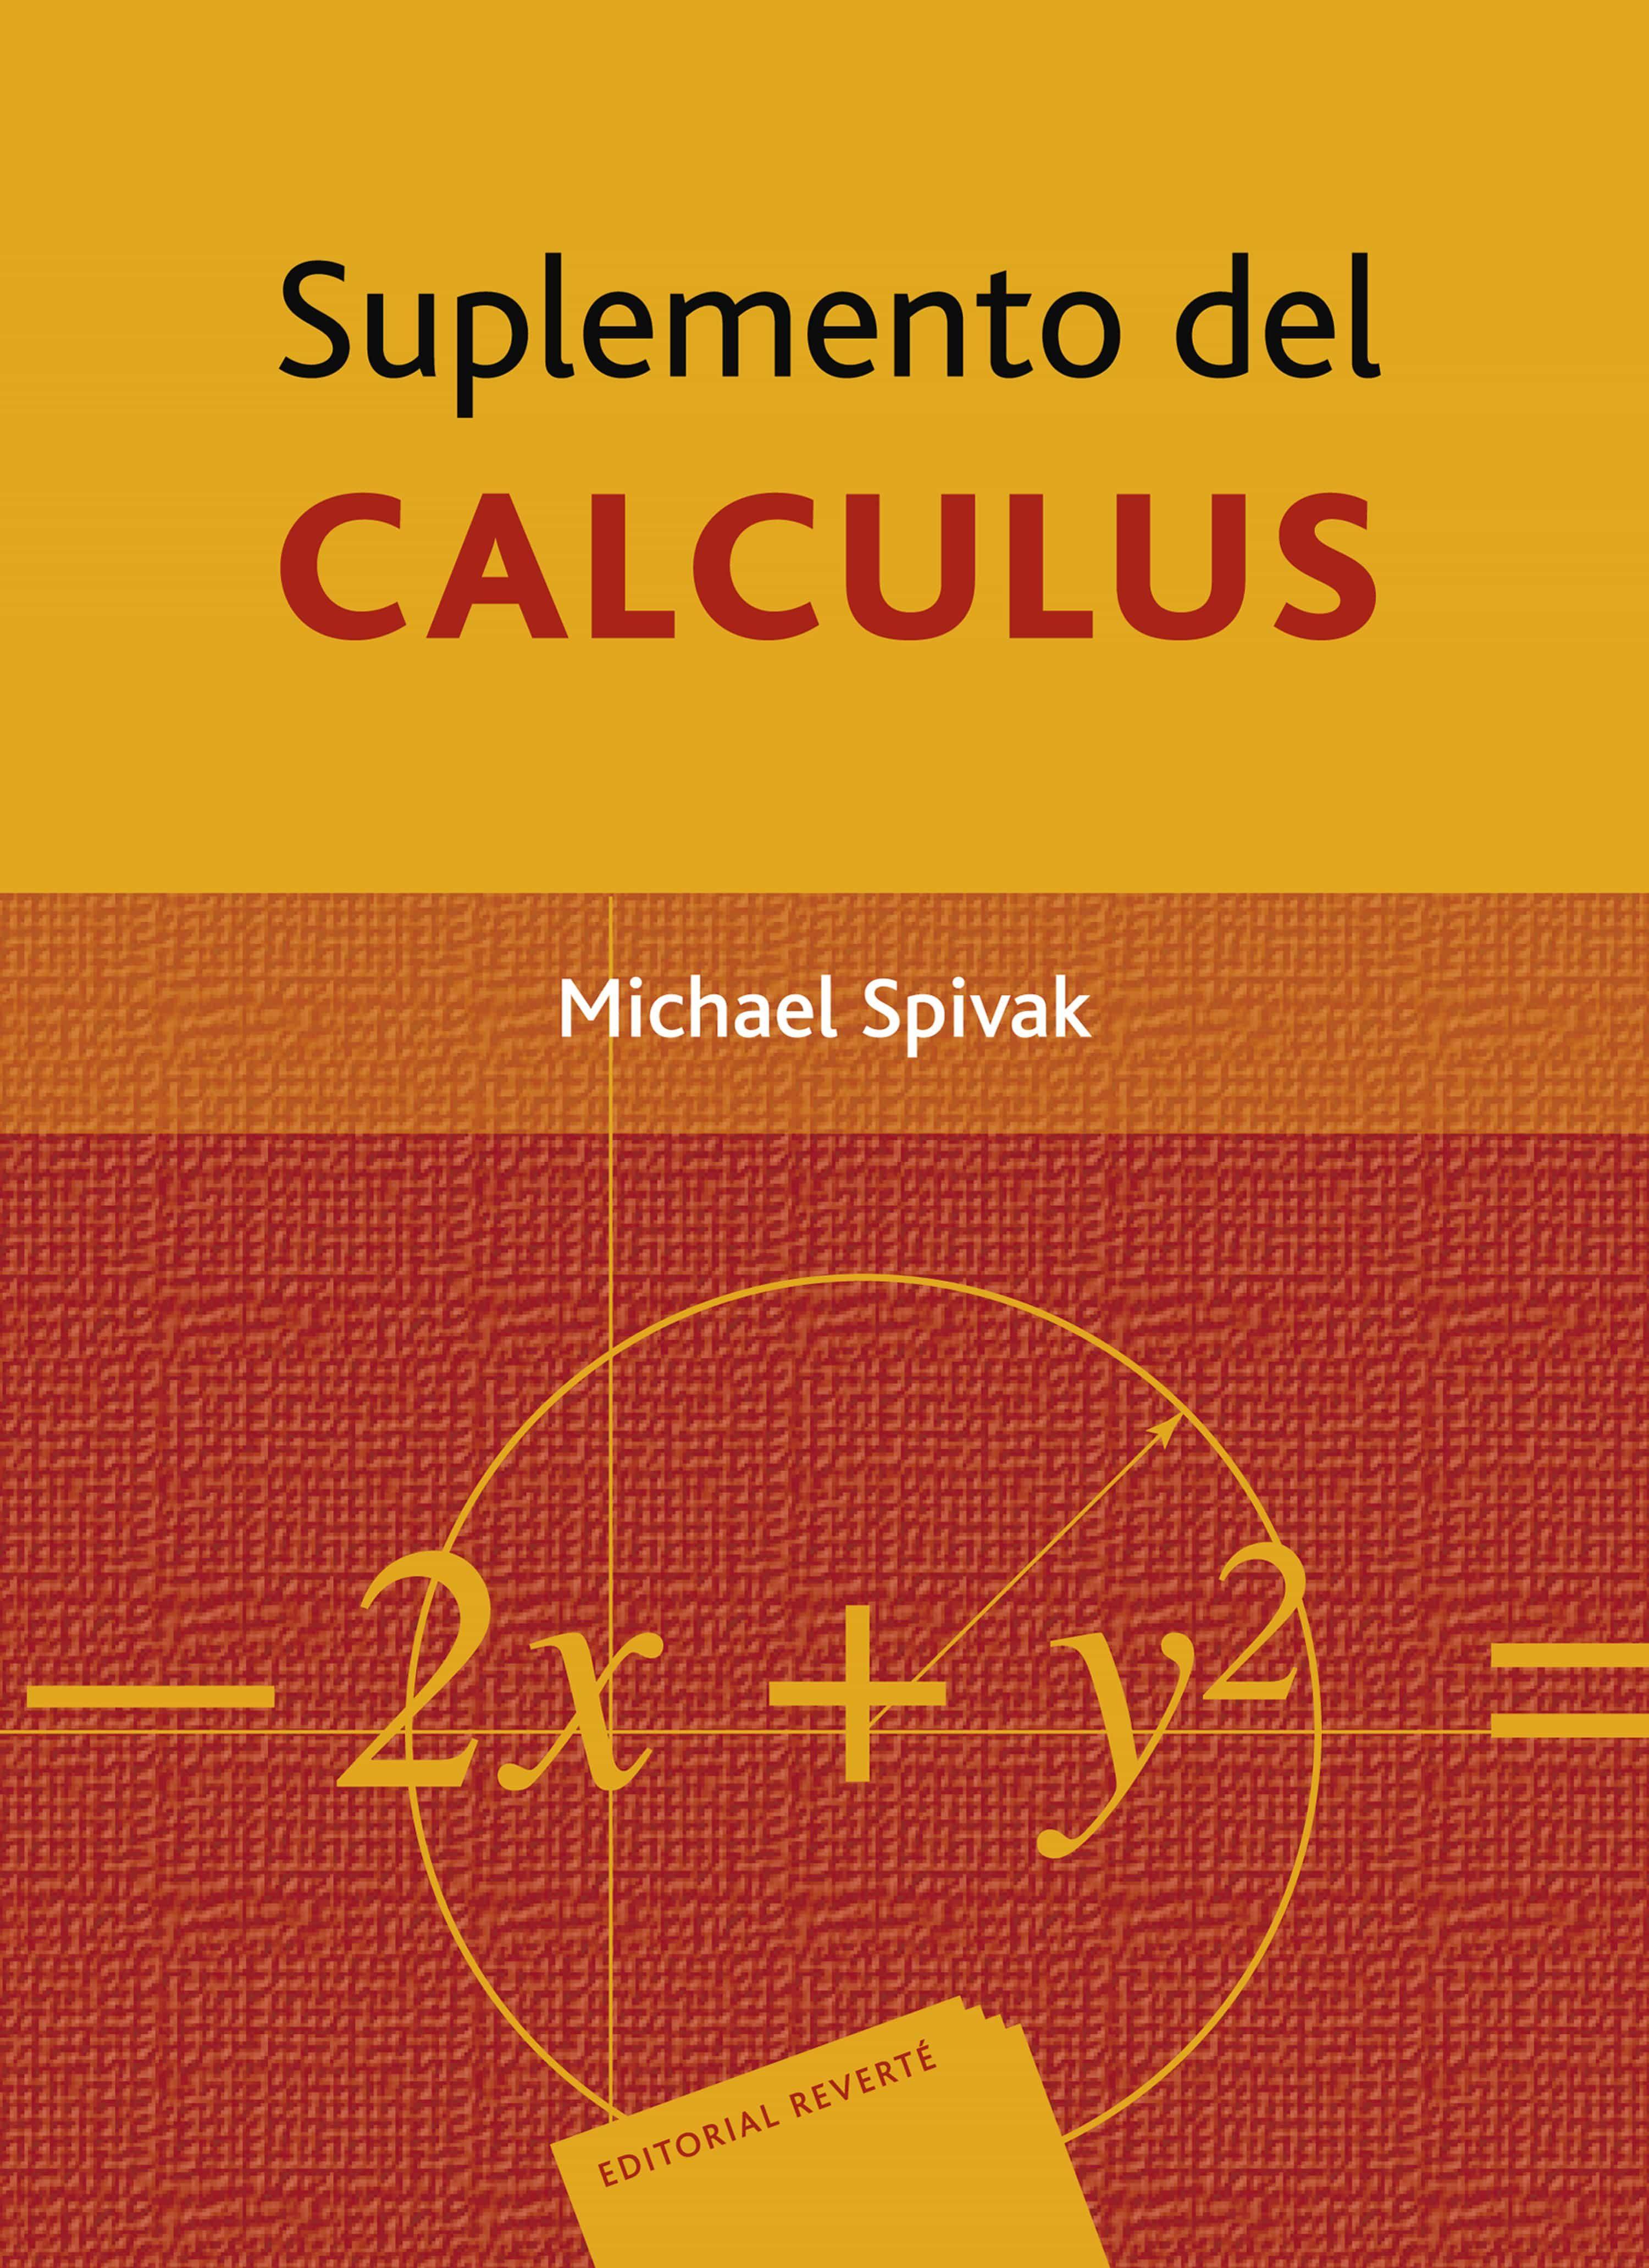 Suplemento Del Calculus por Michael Spivak